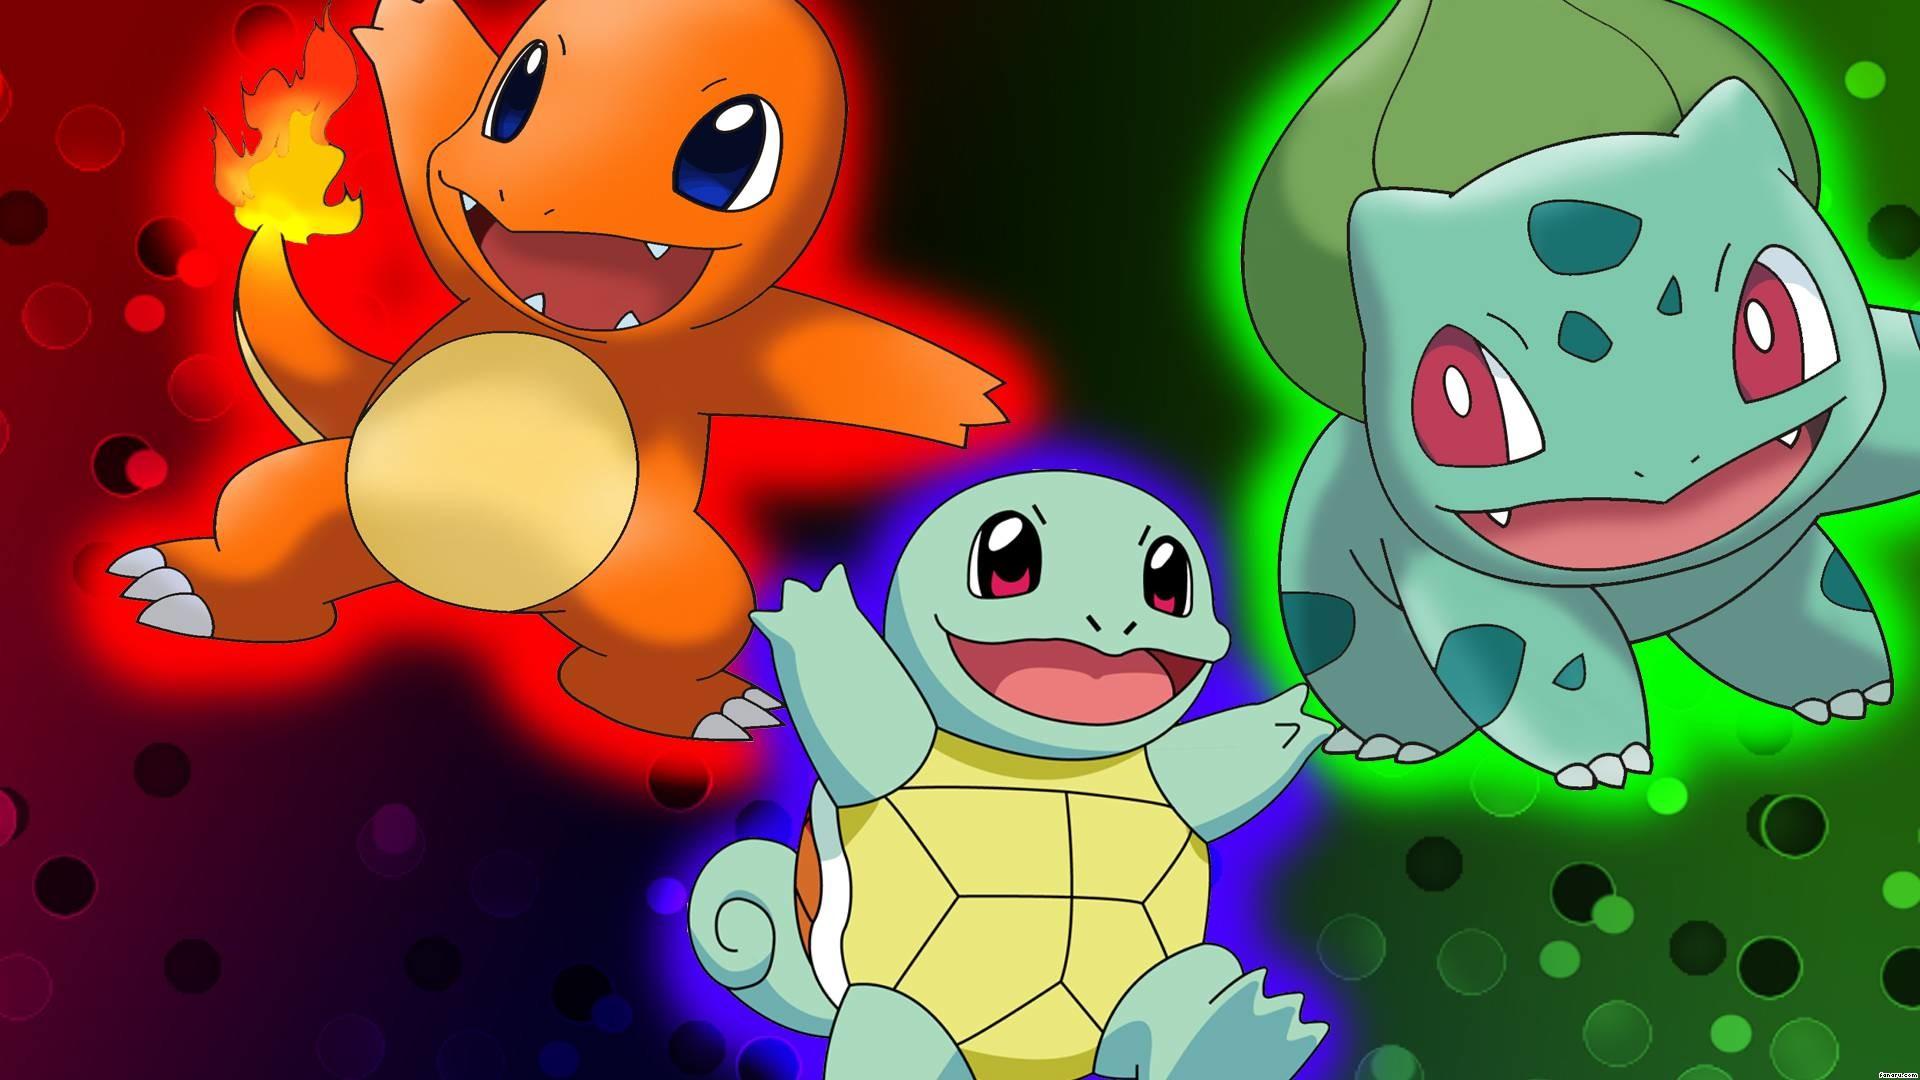 … Starter Pokemon Wallpapers, Starter Pokemon HD Wallpapers Collection:  Item 6524540